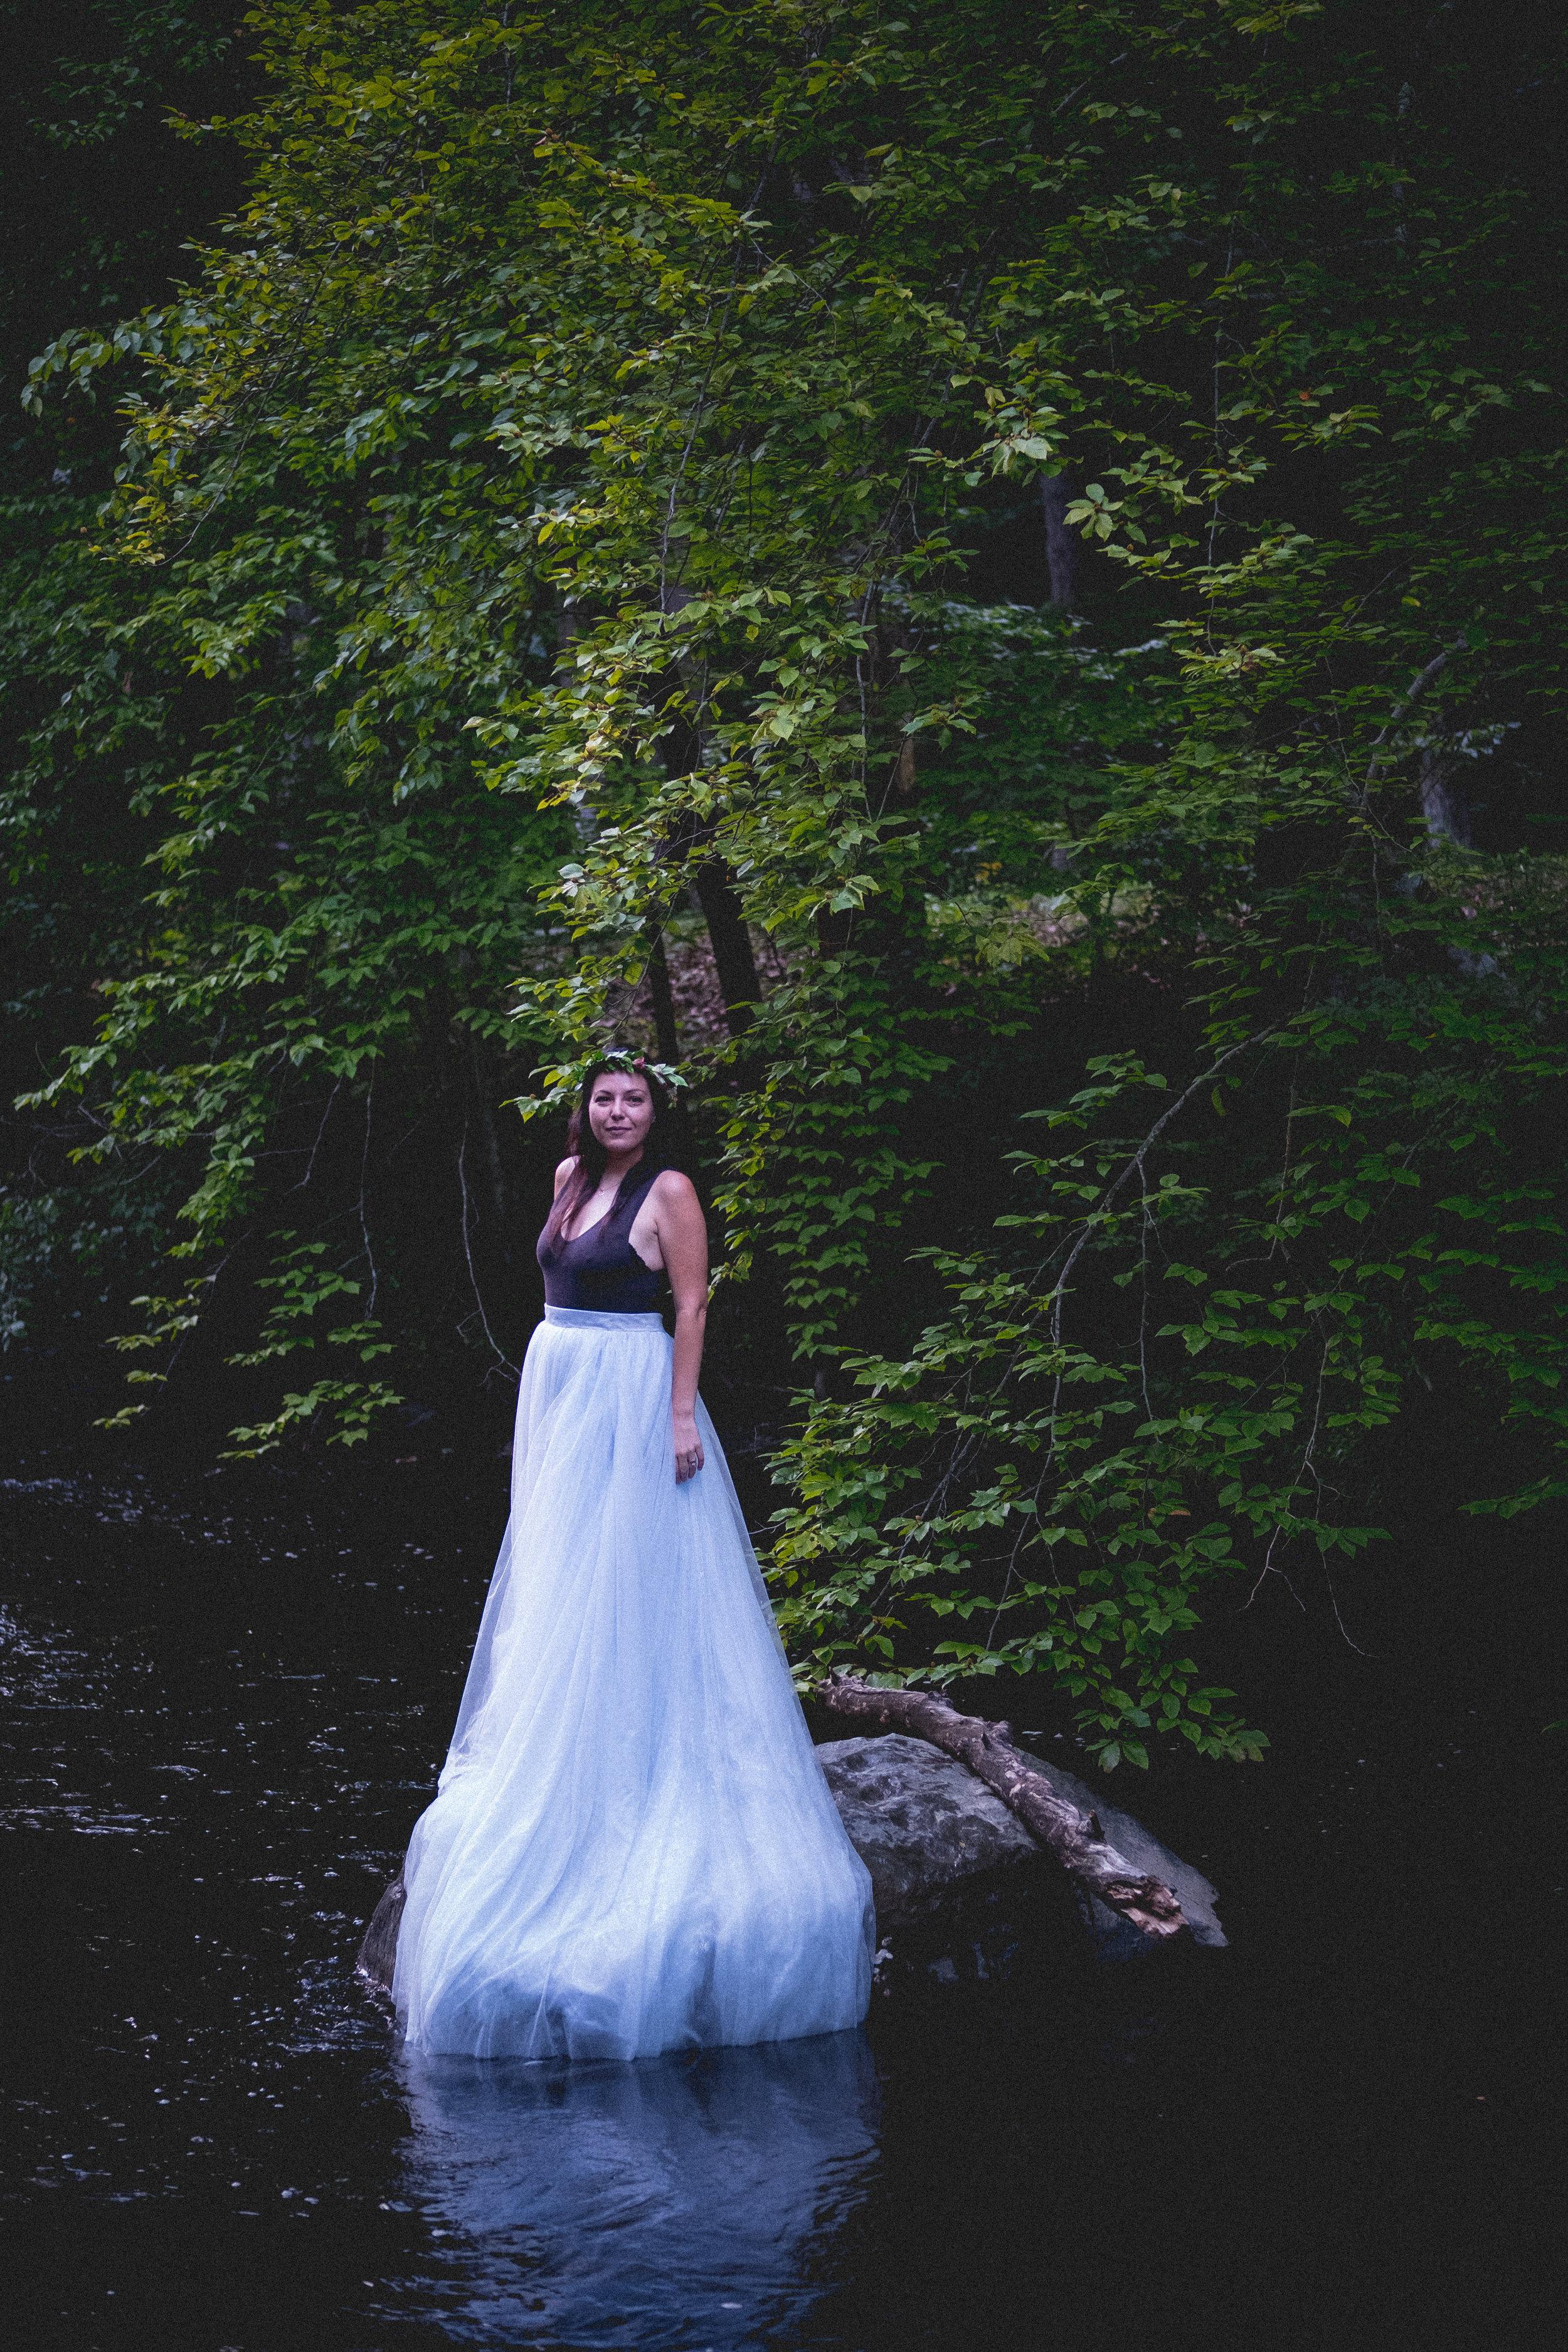 woodland fairygoddess nicole hutnyk.jpg